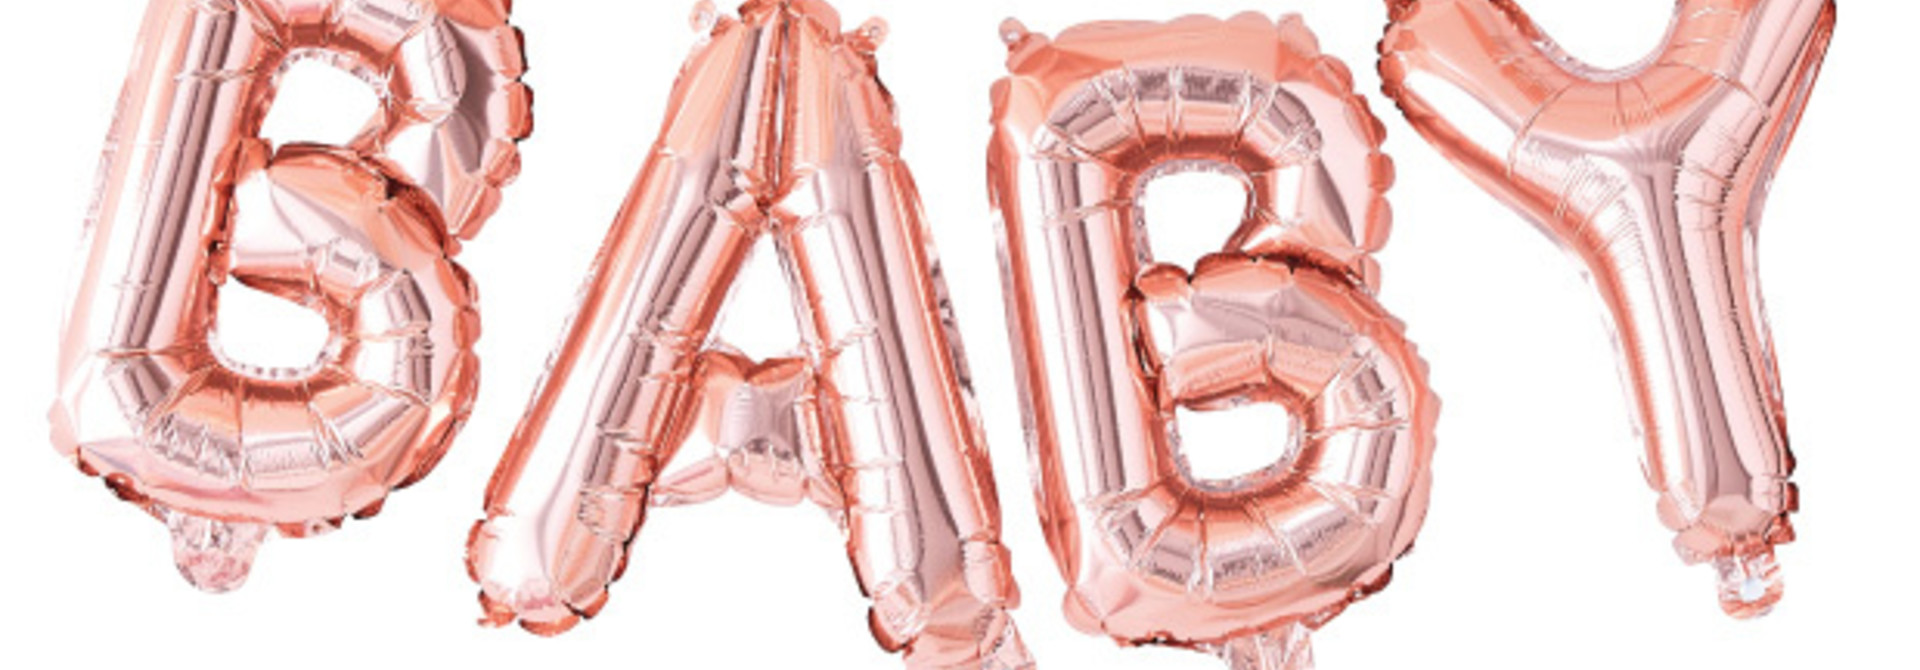 Folieballon baby roségoud Twinkle Twinkle - Ginger Ray